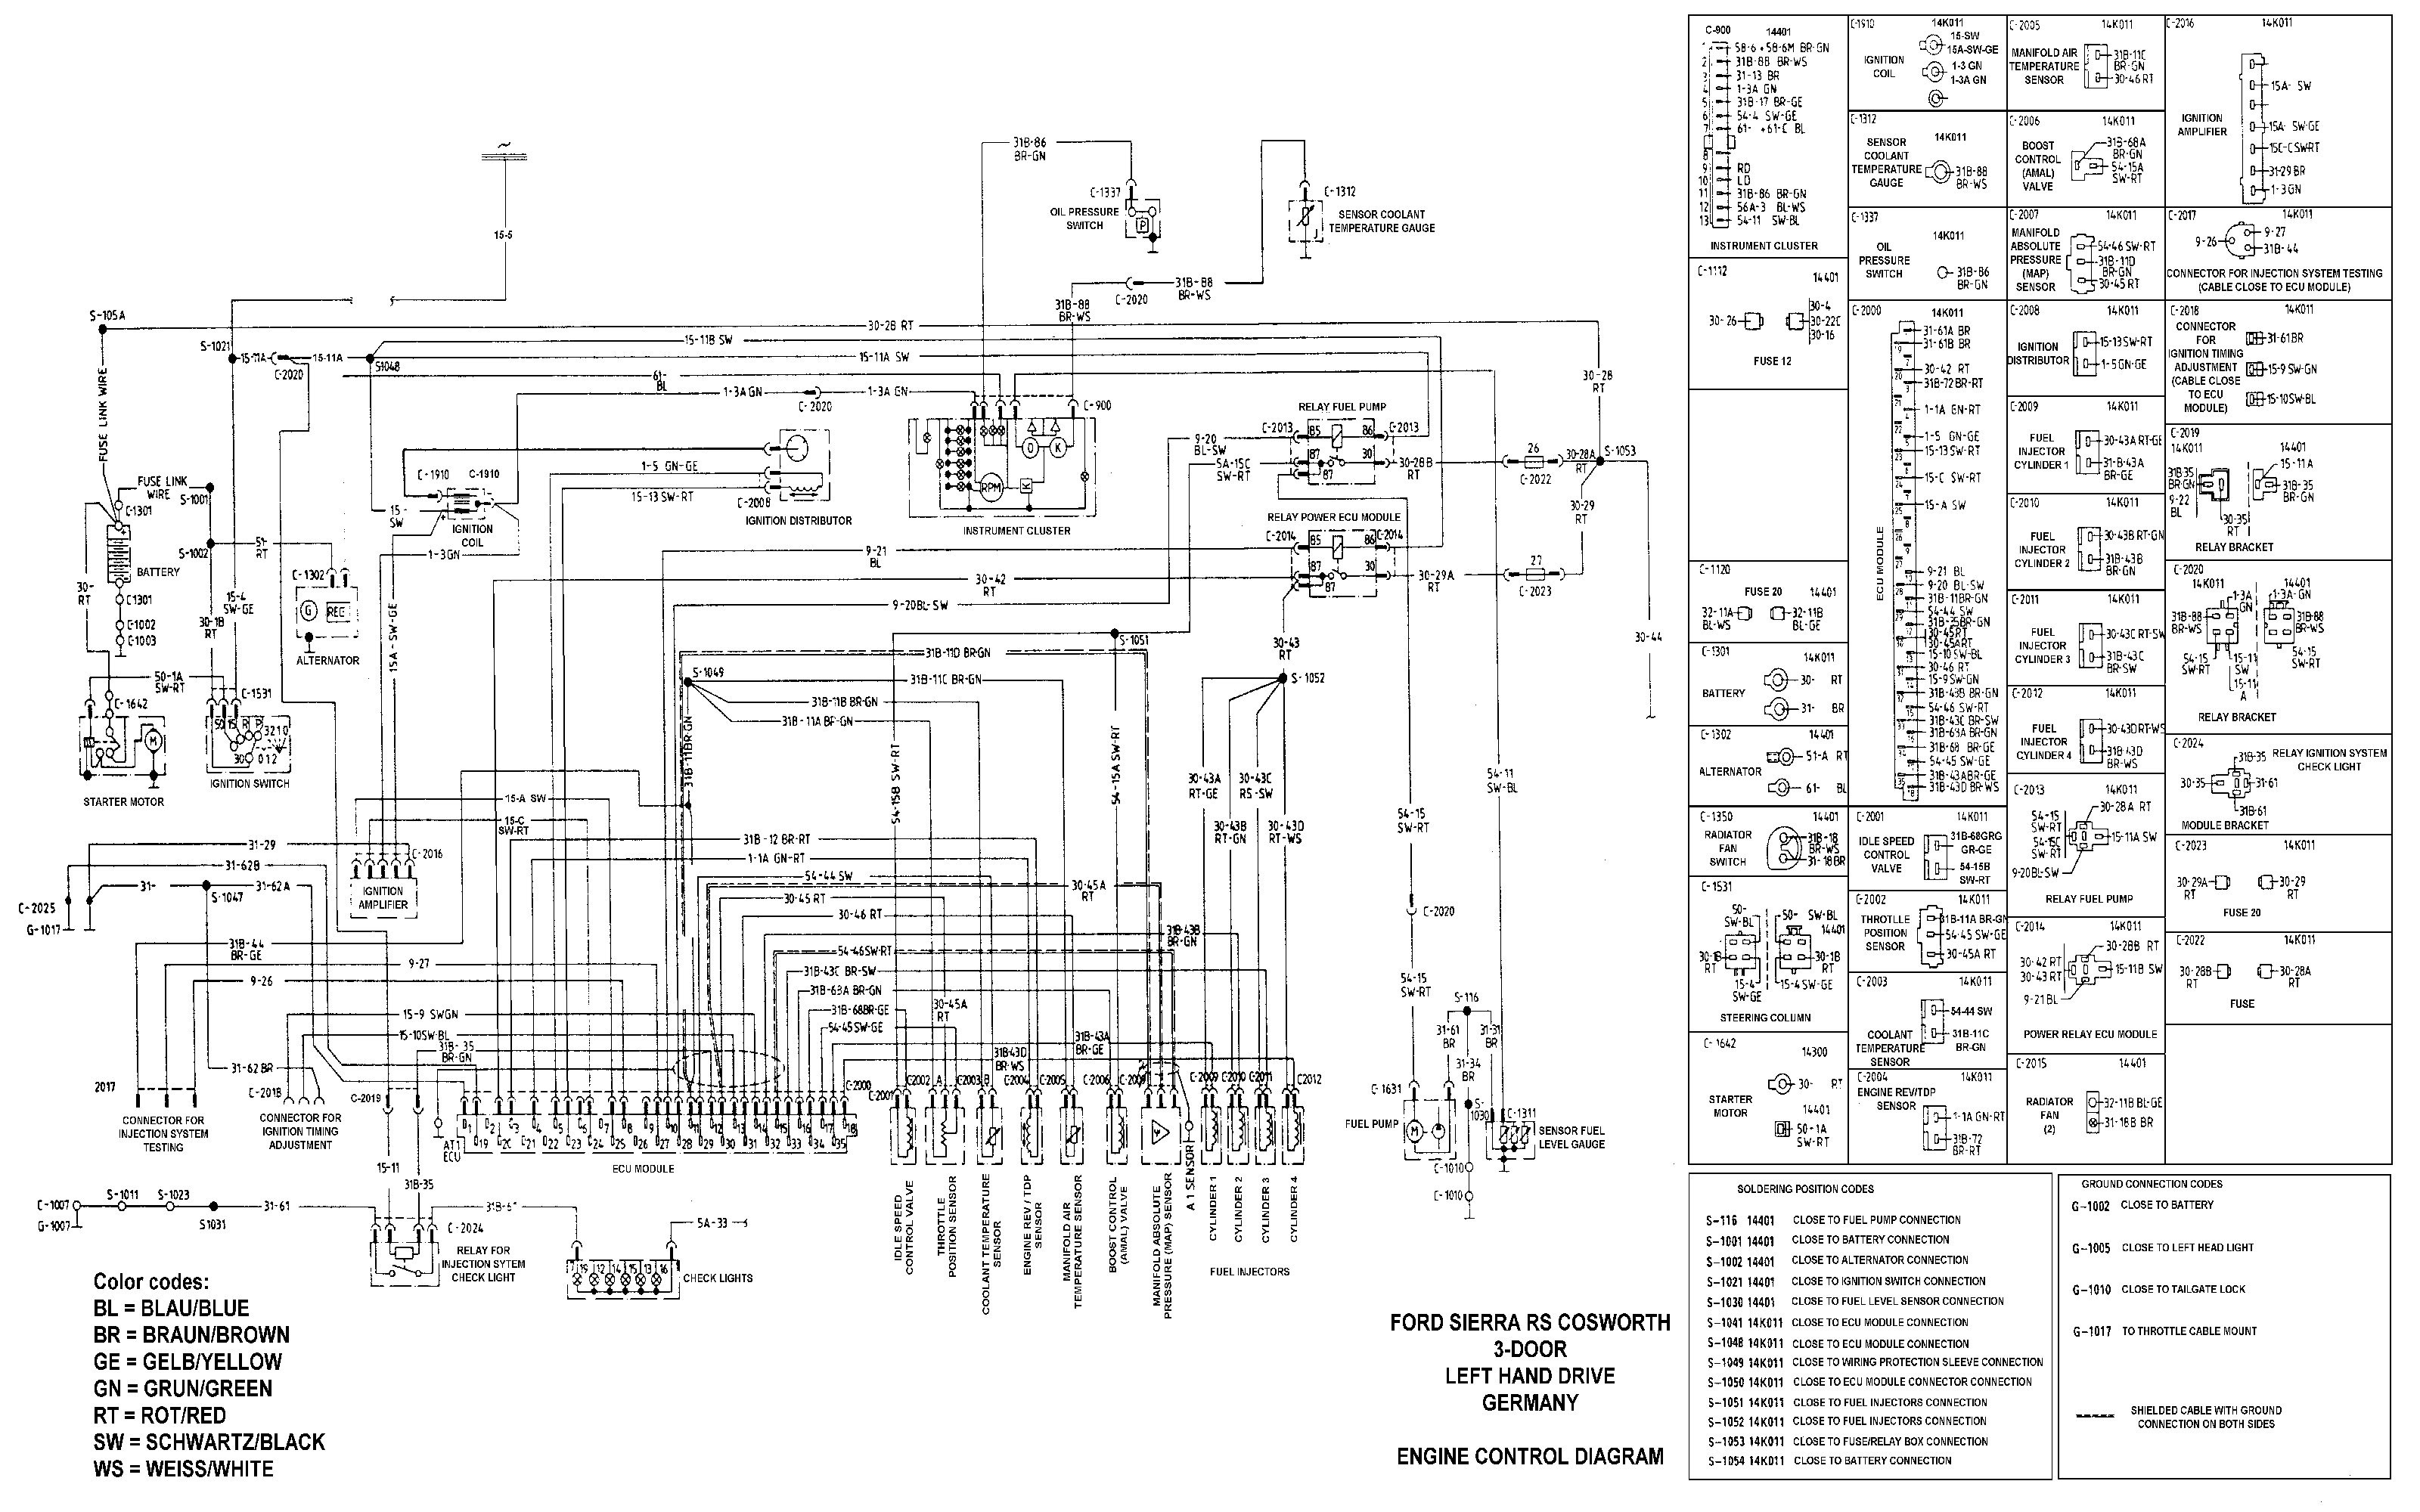 Ford Mk2 Wiring Diagram 100 Revtech